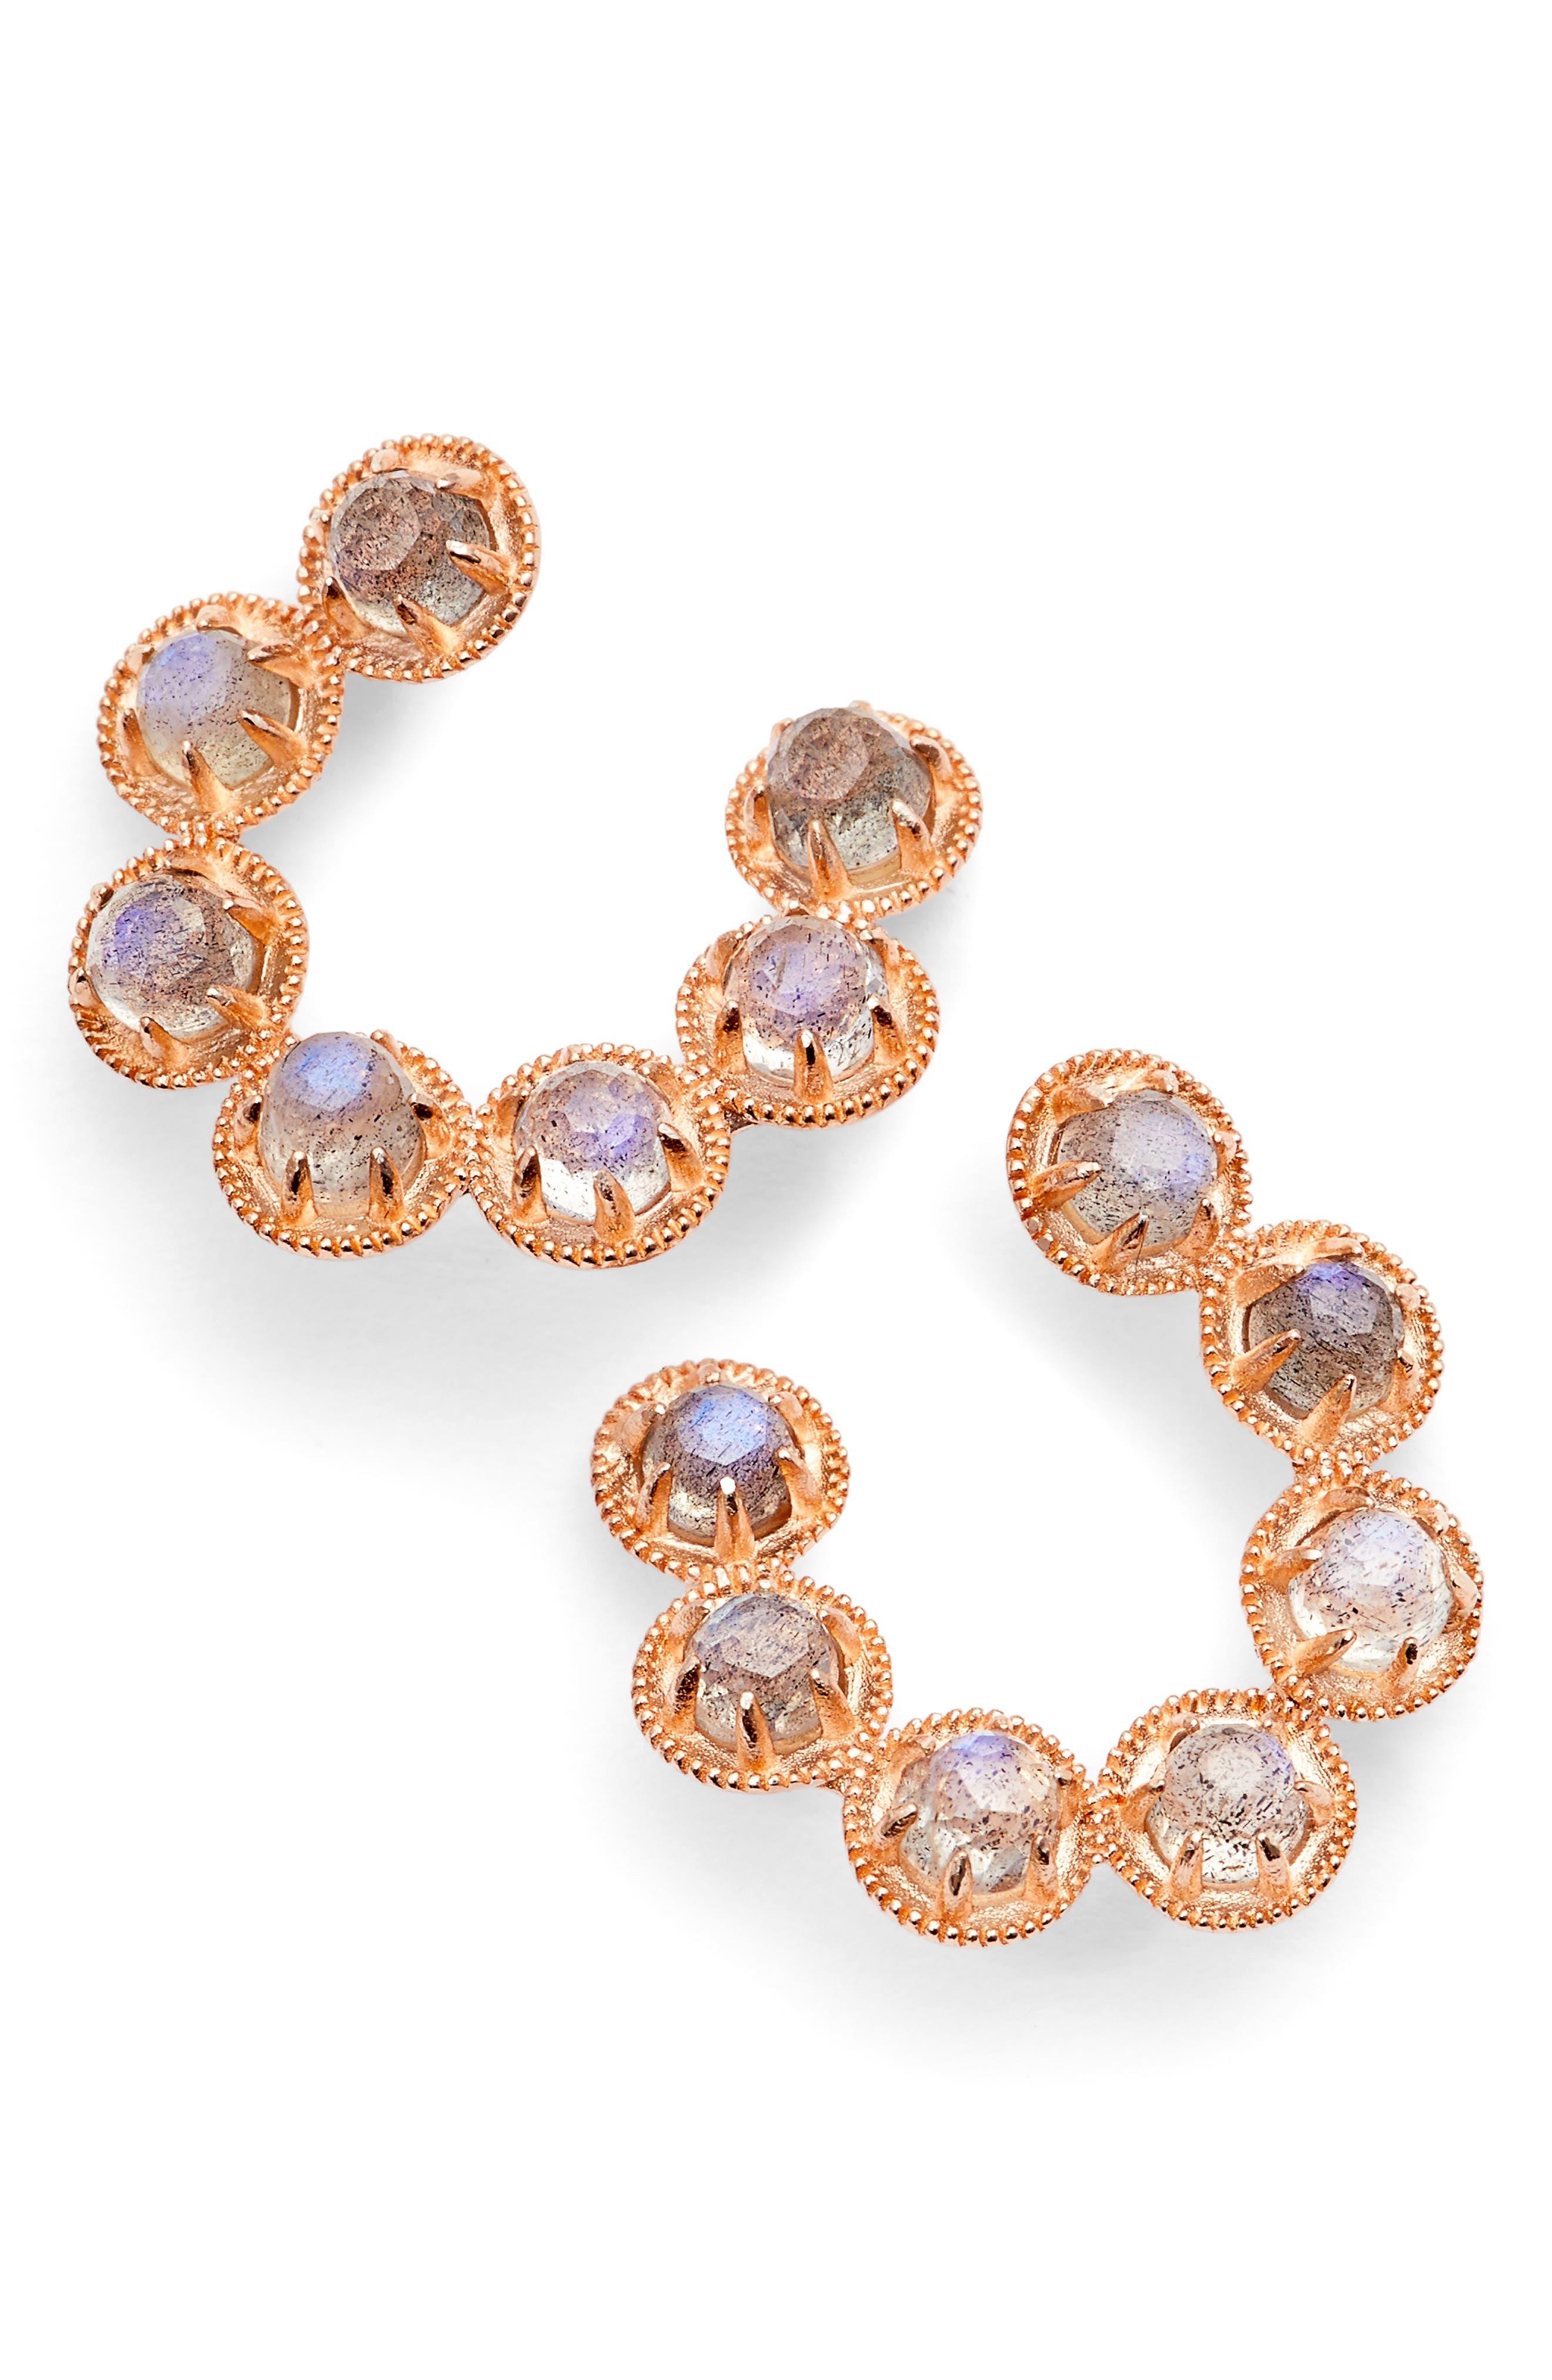 Cleo Vermeil Hoop Earrings,                             Main thumbnail 1, color,                             Moonstone/ Rose Gold